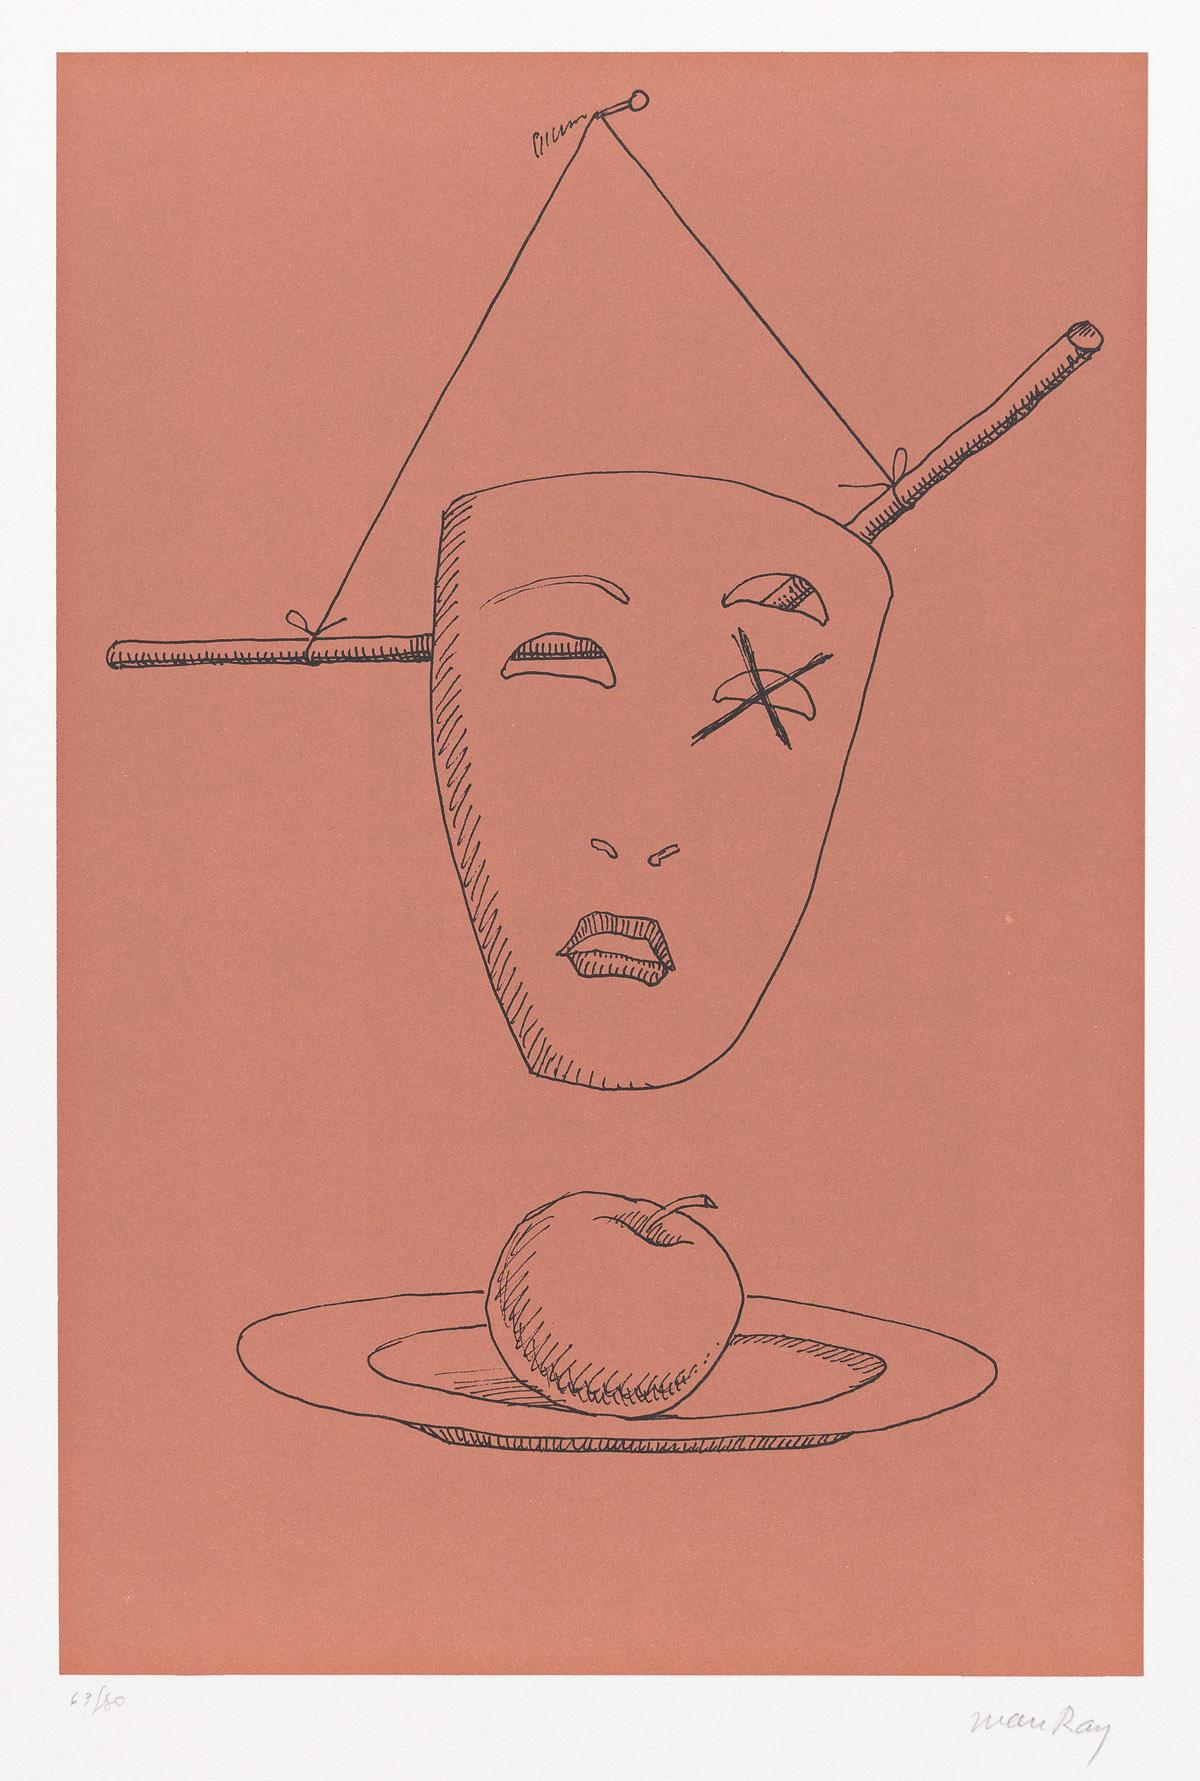 MAN RAY (1890-1976) Les Six Masques Voyants.